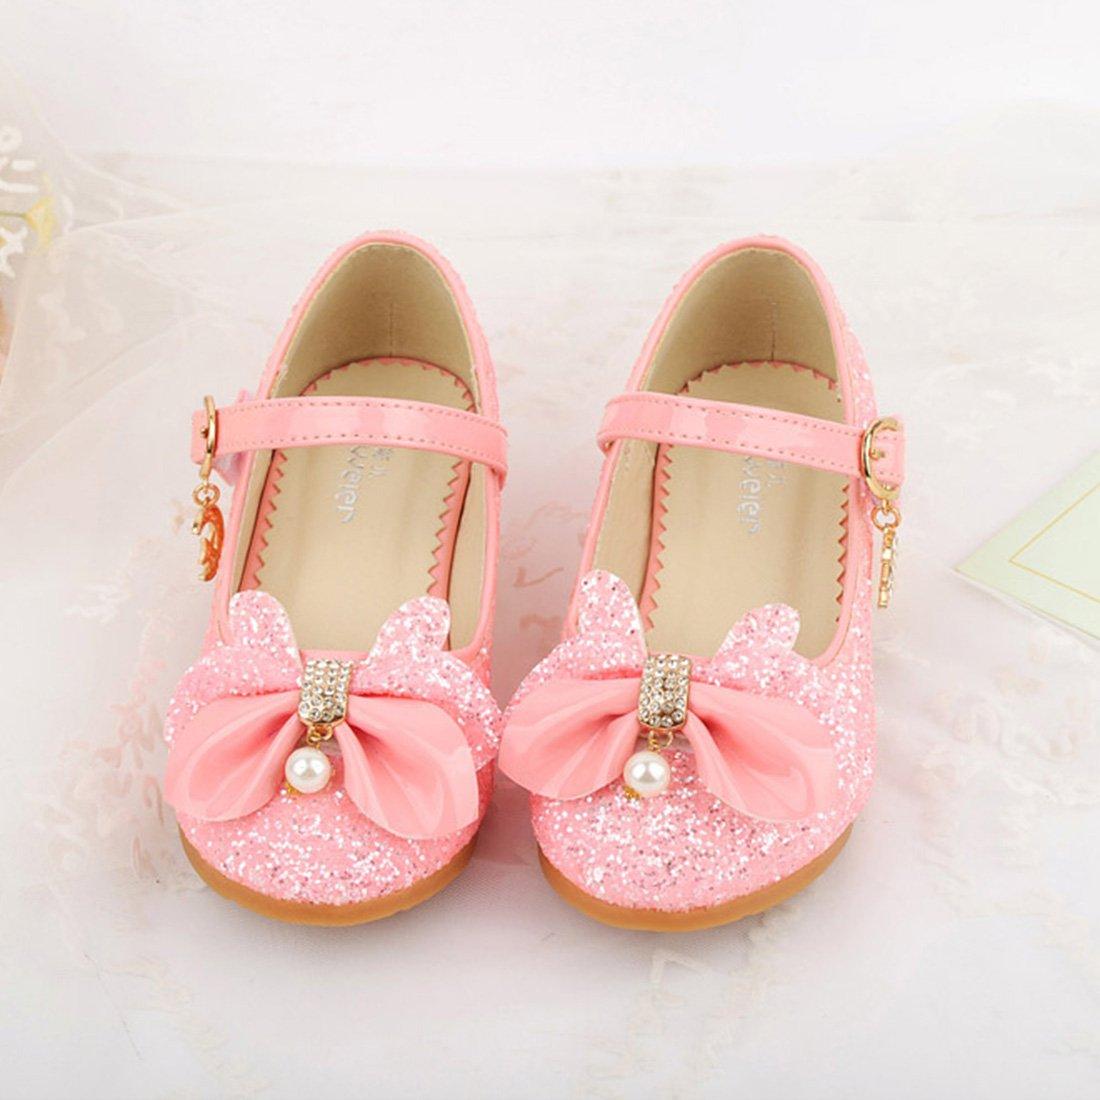 YIBLBOX Kid Girls Mary Jane Princess Dance Shoe Glitter Party Dress Performance Low Heels Shoes